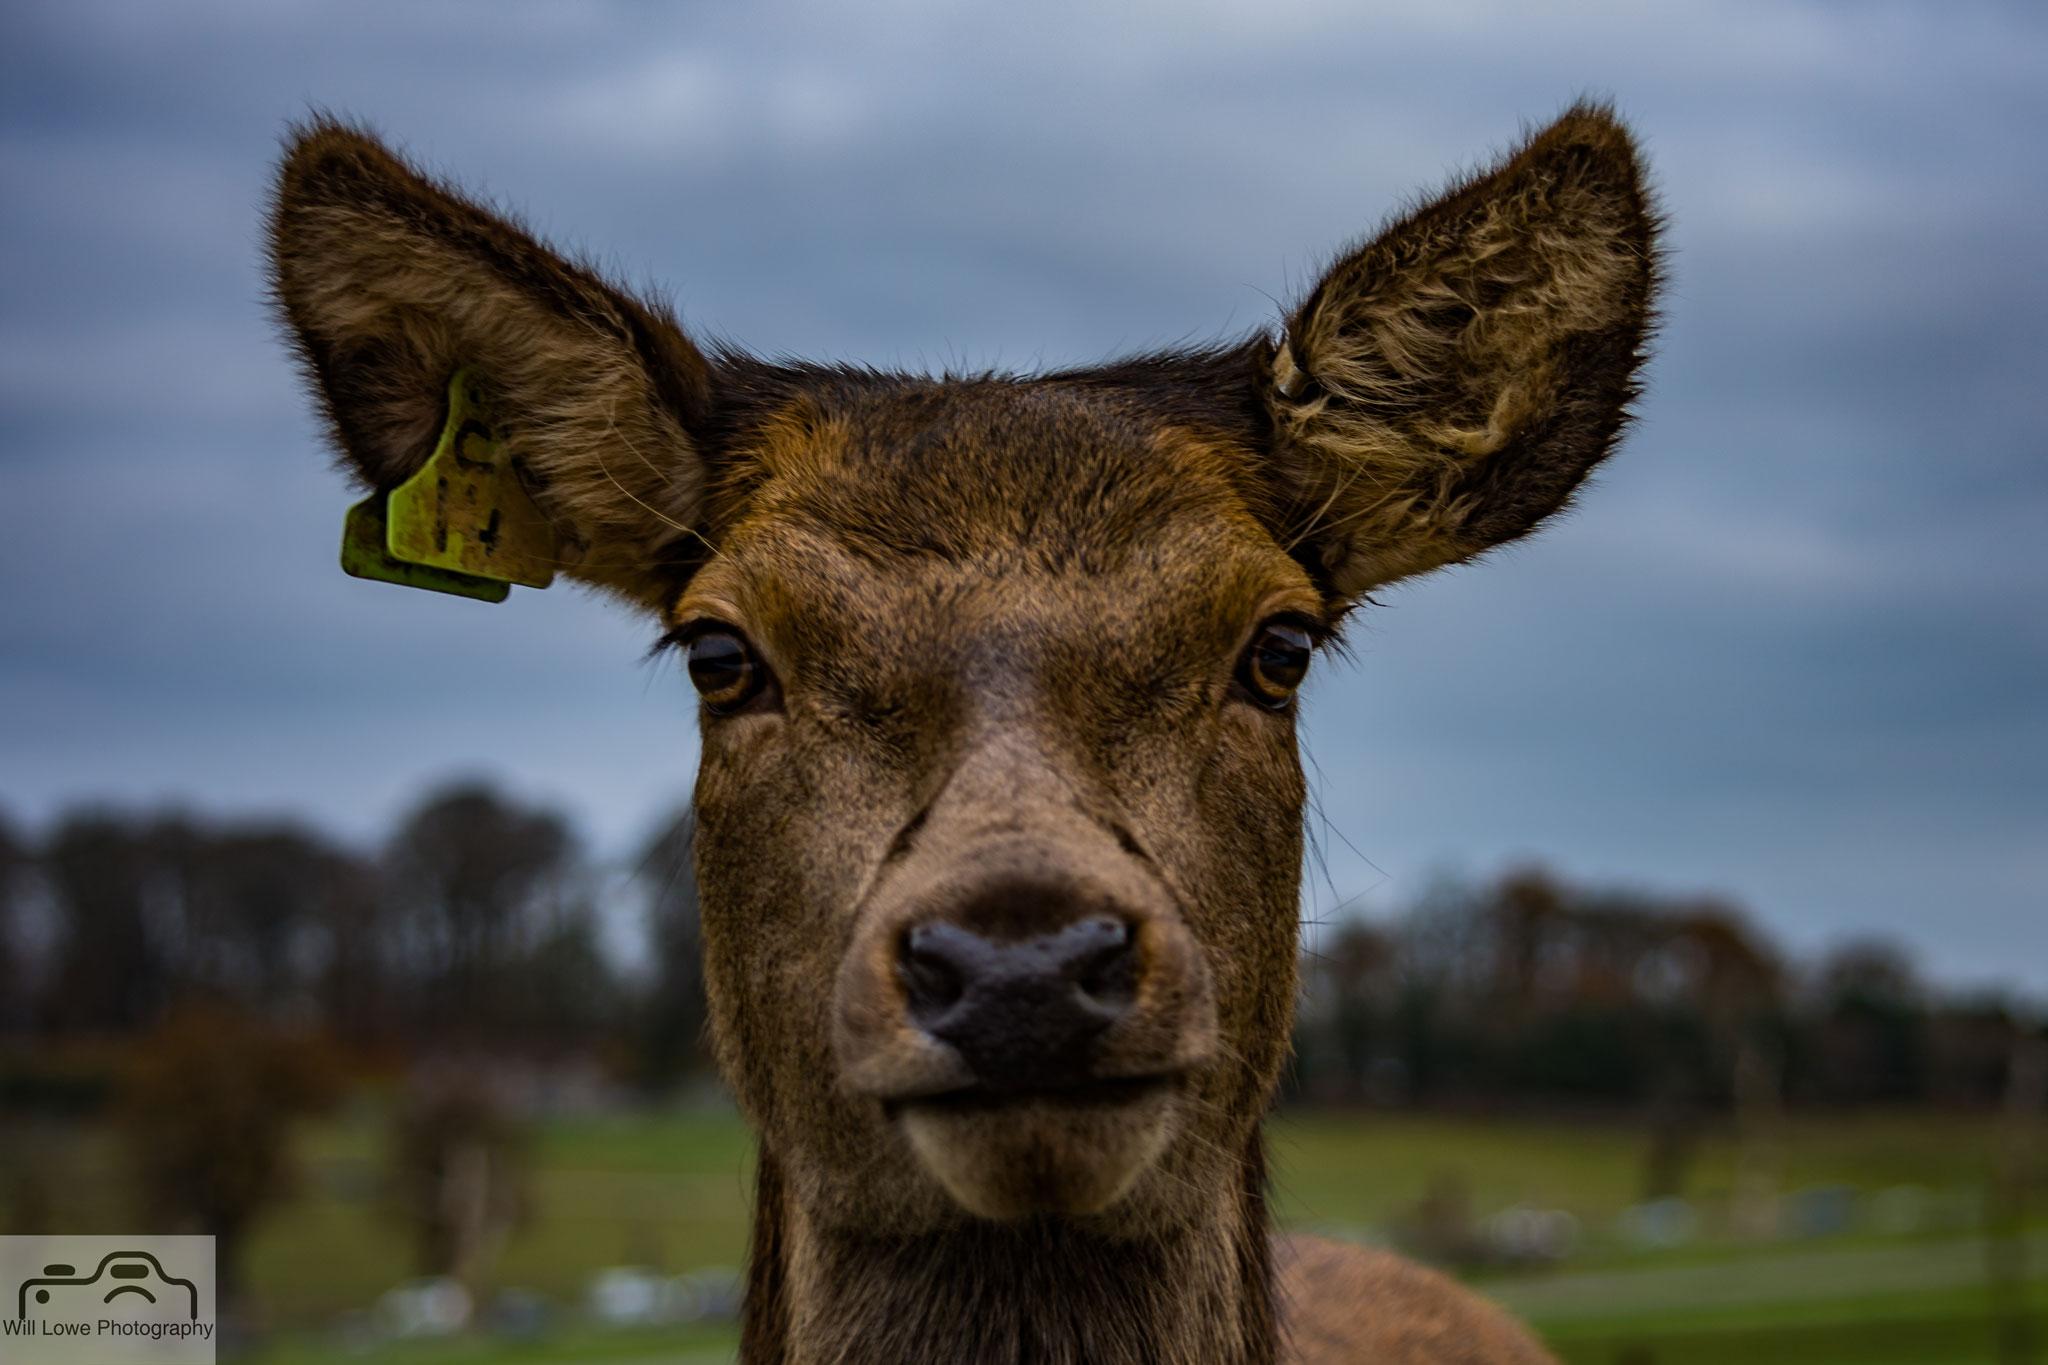 Deer - Longleet